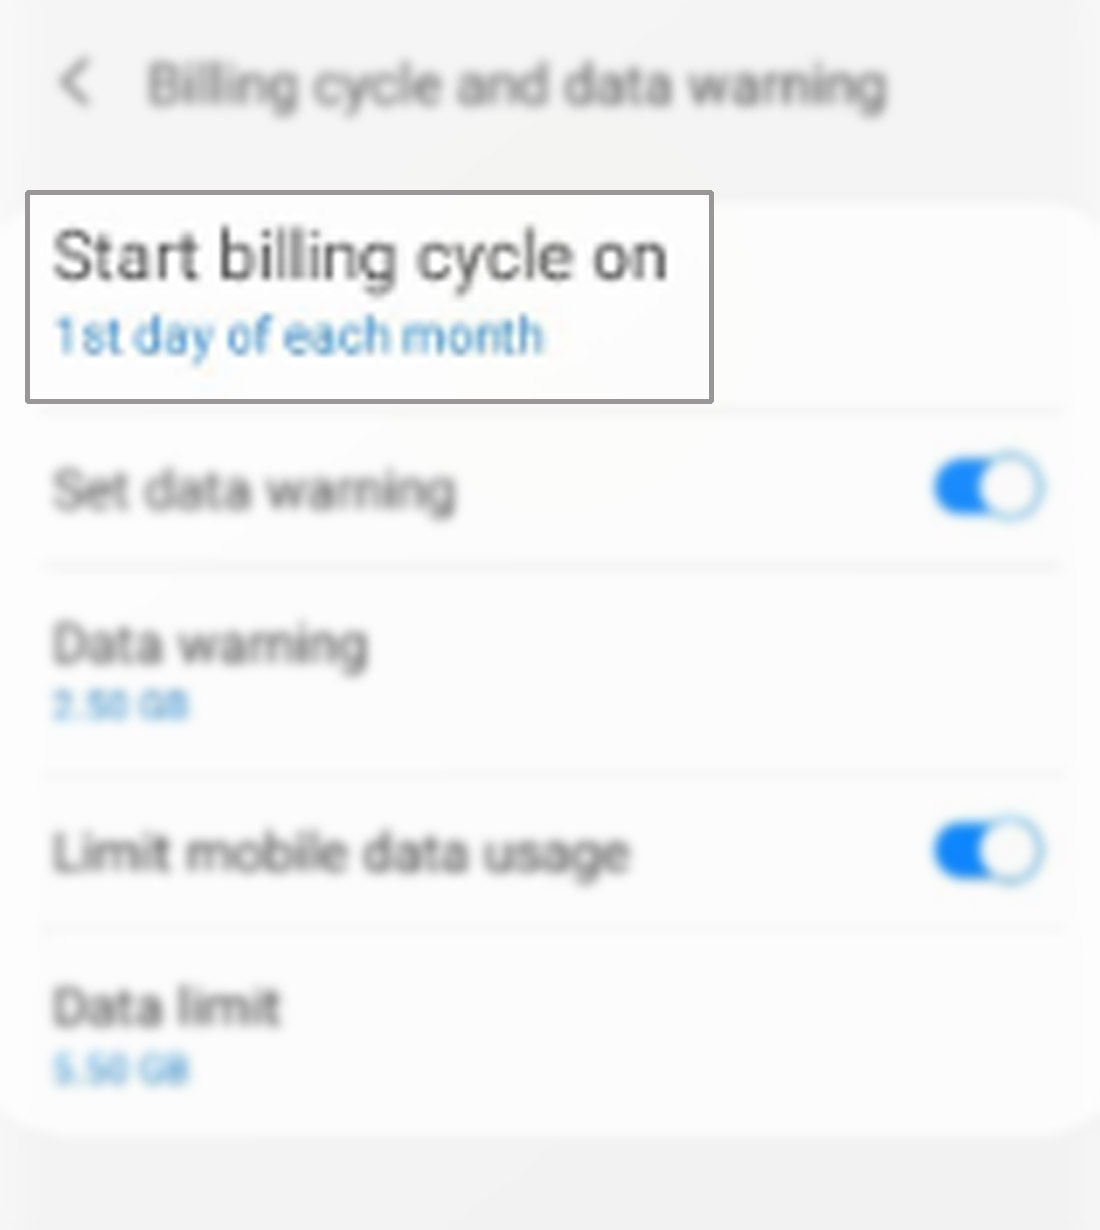 manage data usage galaxy s20 - start billing cycle on